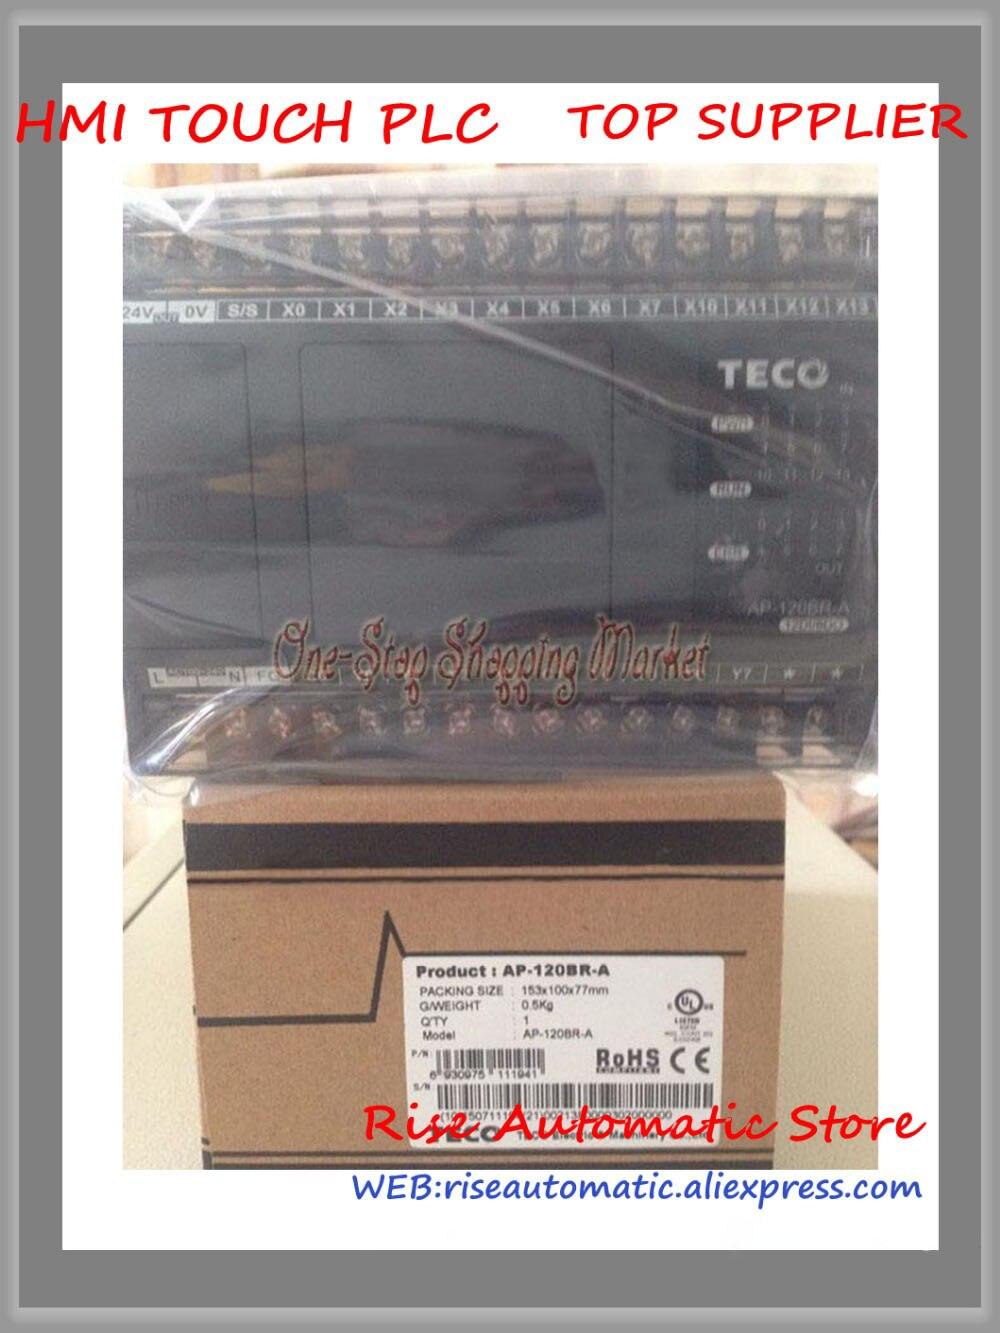 AP-120BR-A PLC 100-240VAC NPN/PNP 16 point Relay 14 point AP New OriginalAP-120BR-A PLC 100-240VAC NPN/PNP 16 point Relay 14 point AP New Original